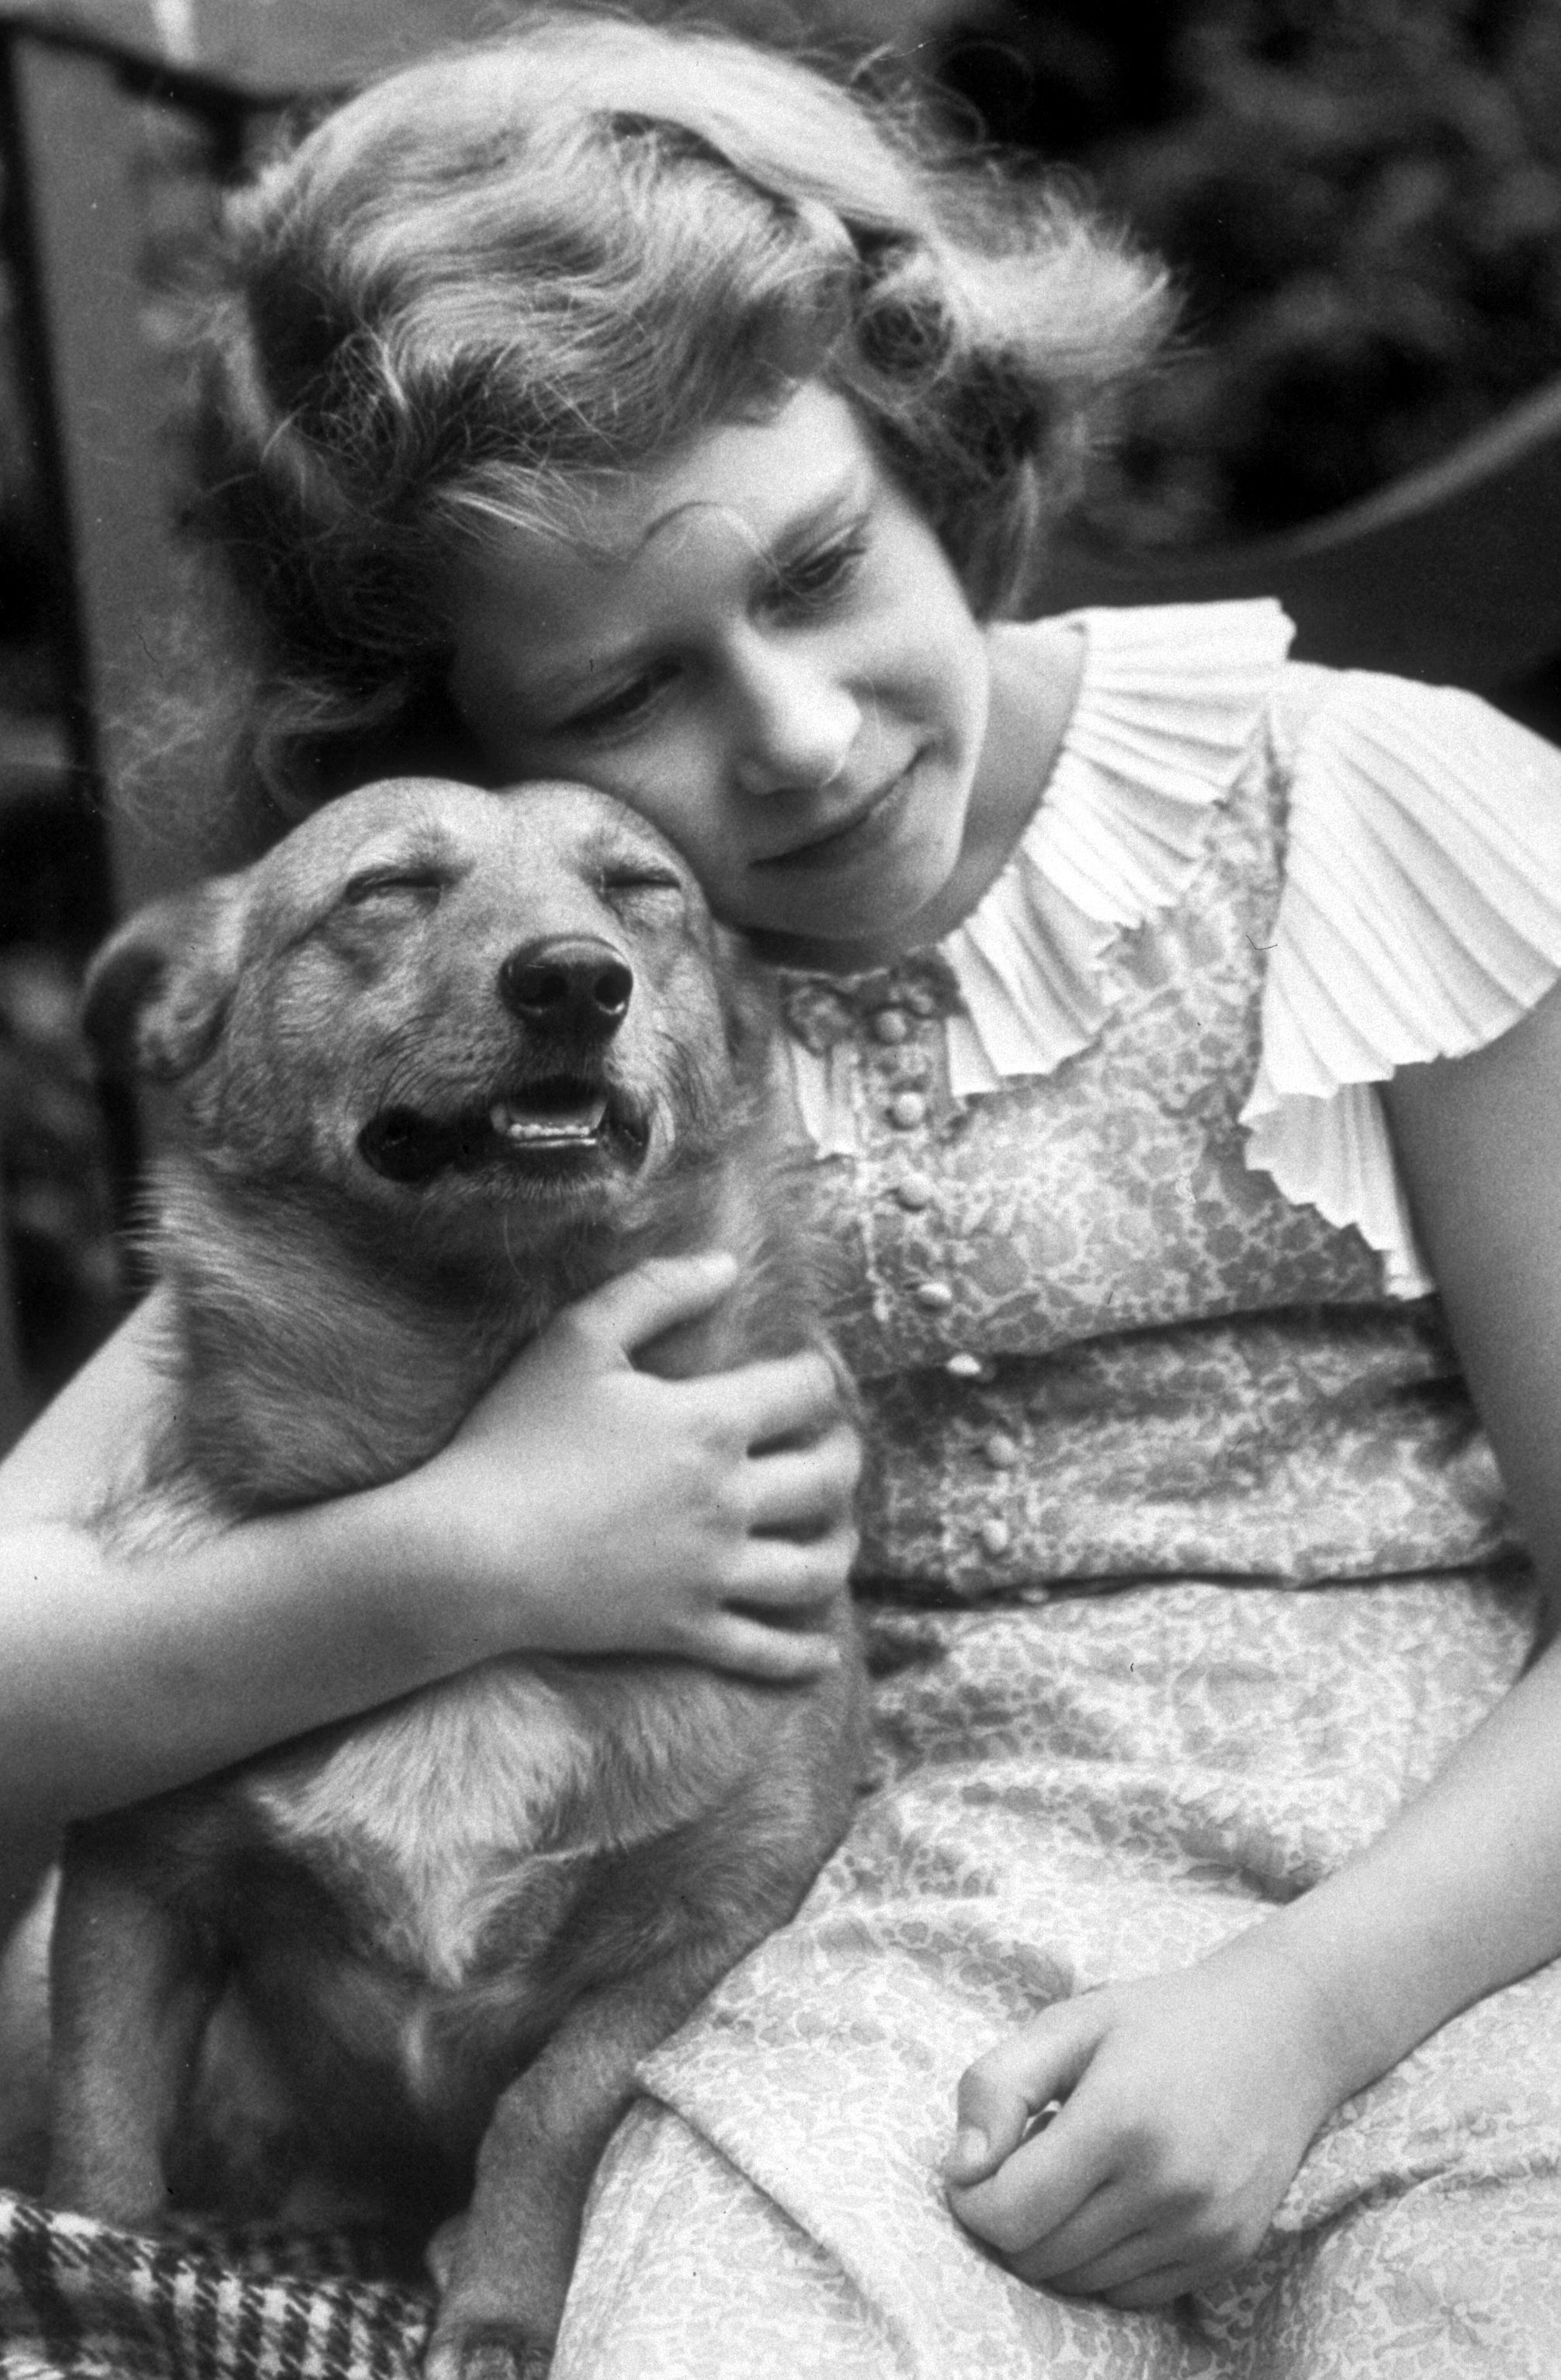 July 1936:  Princess Elizabeth hugging a corgi dog.  (Photo by Lisa Sheridan/Studio Lisa/Getty Images)